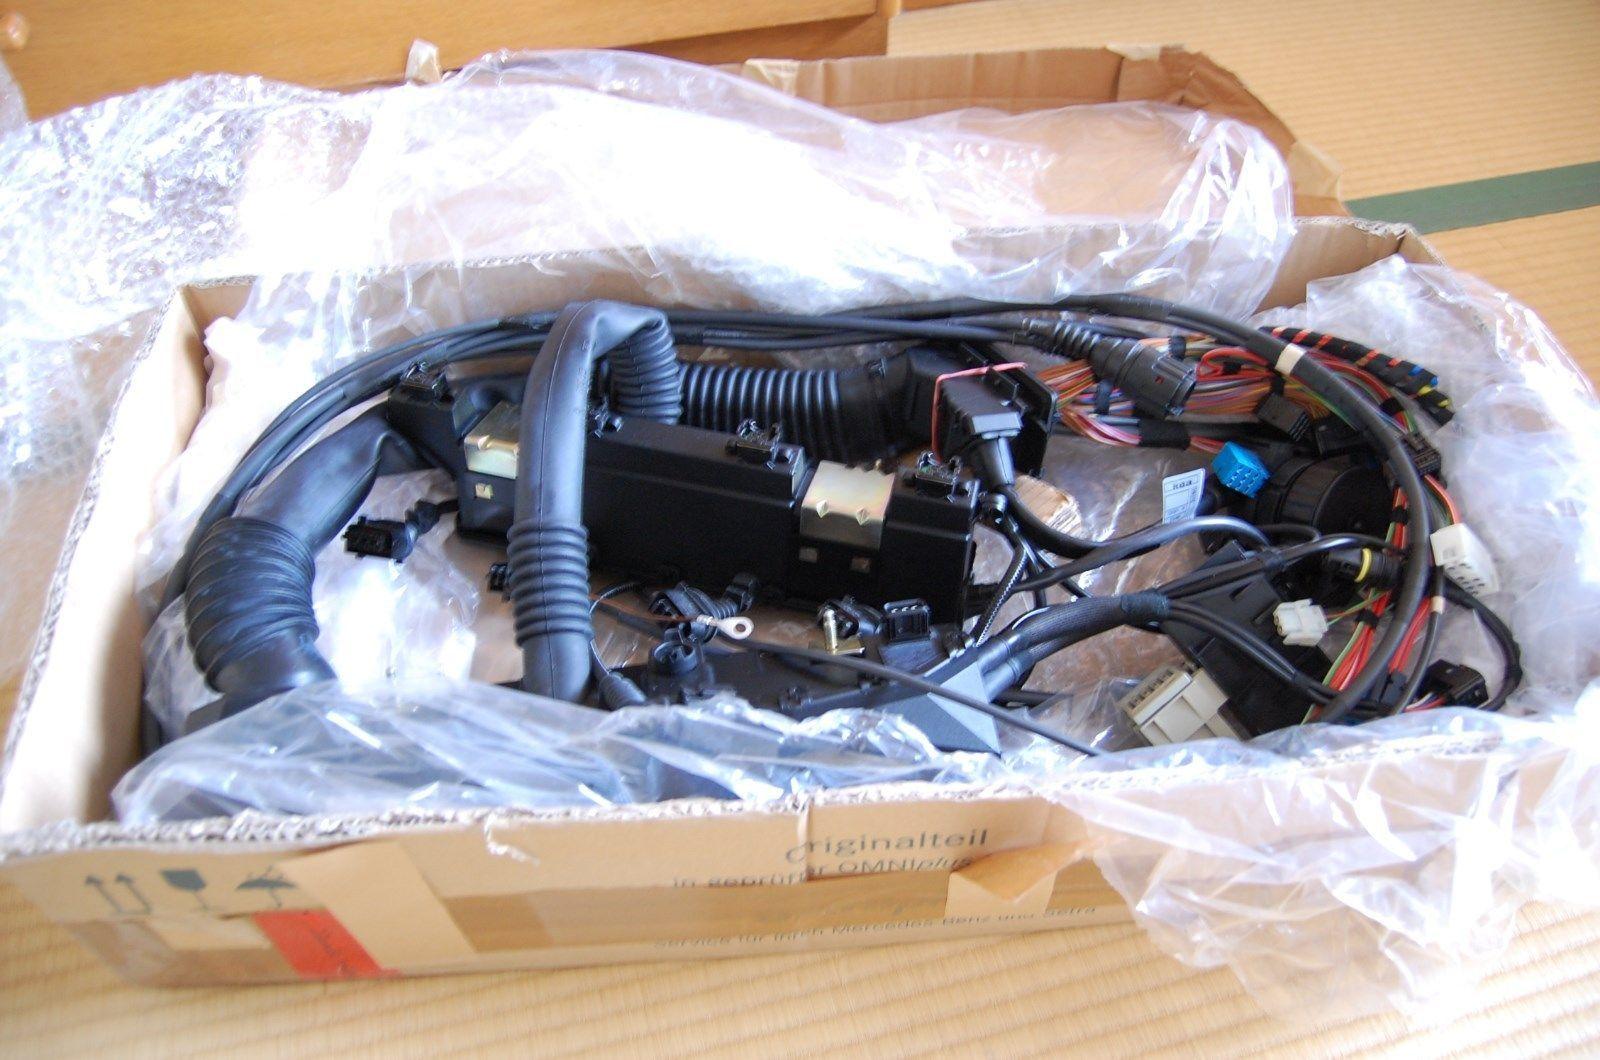 0711eddea2a7b8de8077b1a6598bbd86 bmw e38 engine wiring harness v8 m62 09 199907 2001 motors, auto BMW R80 Wiring Harness at virtualis.co